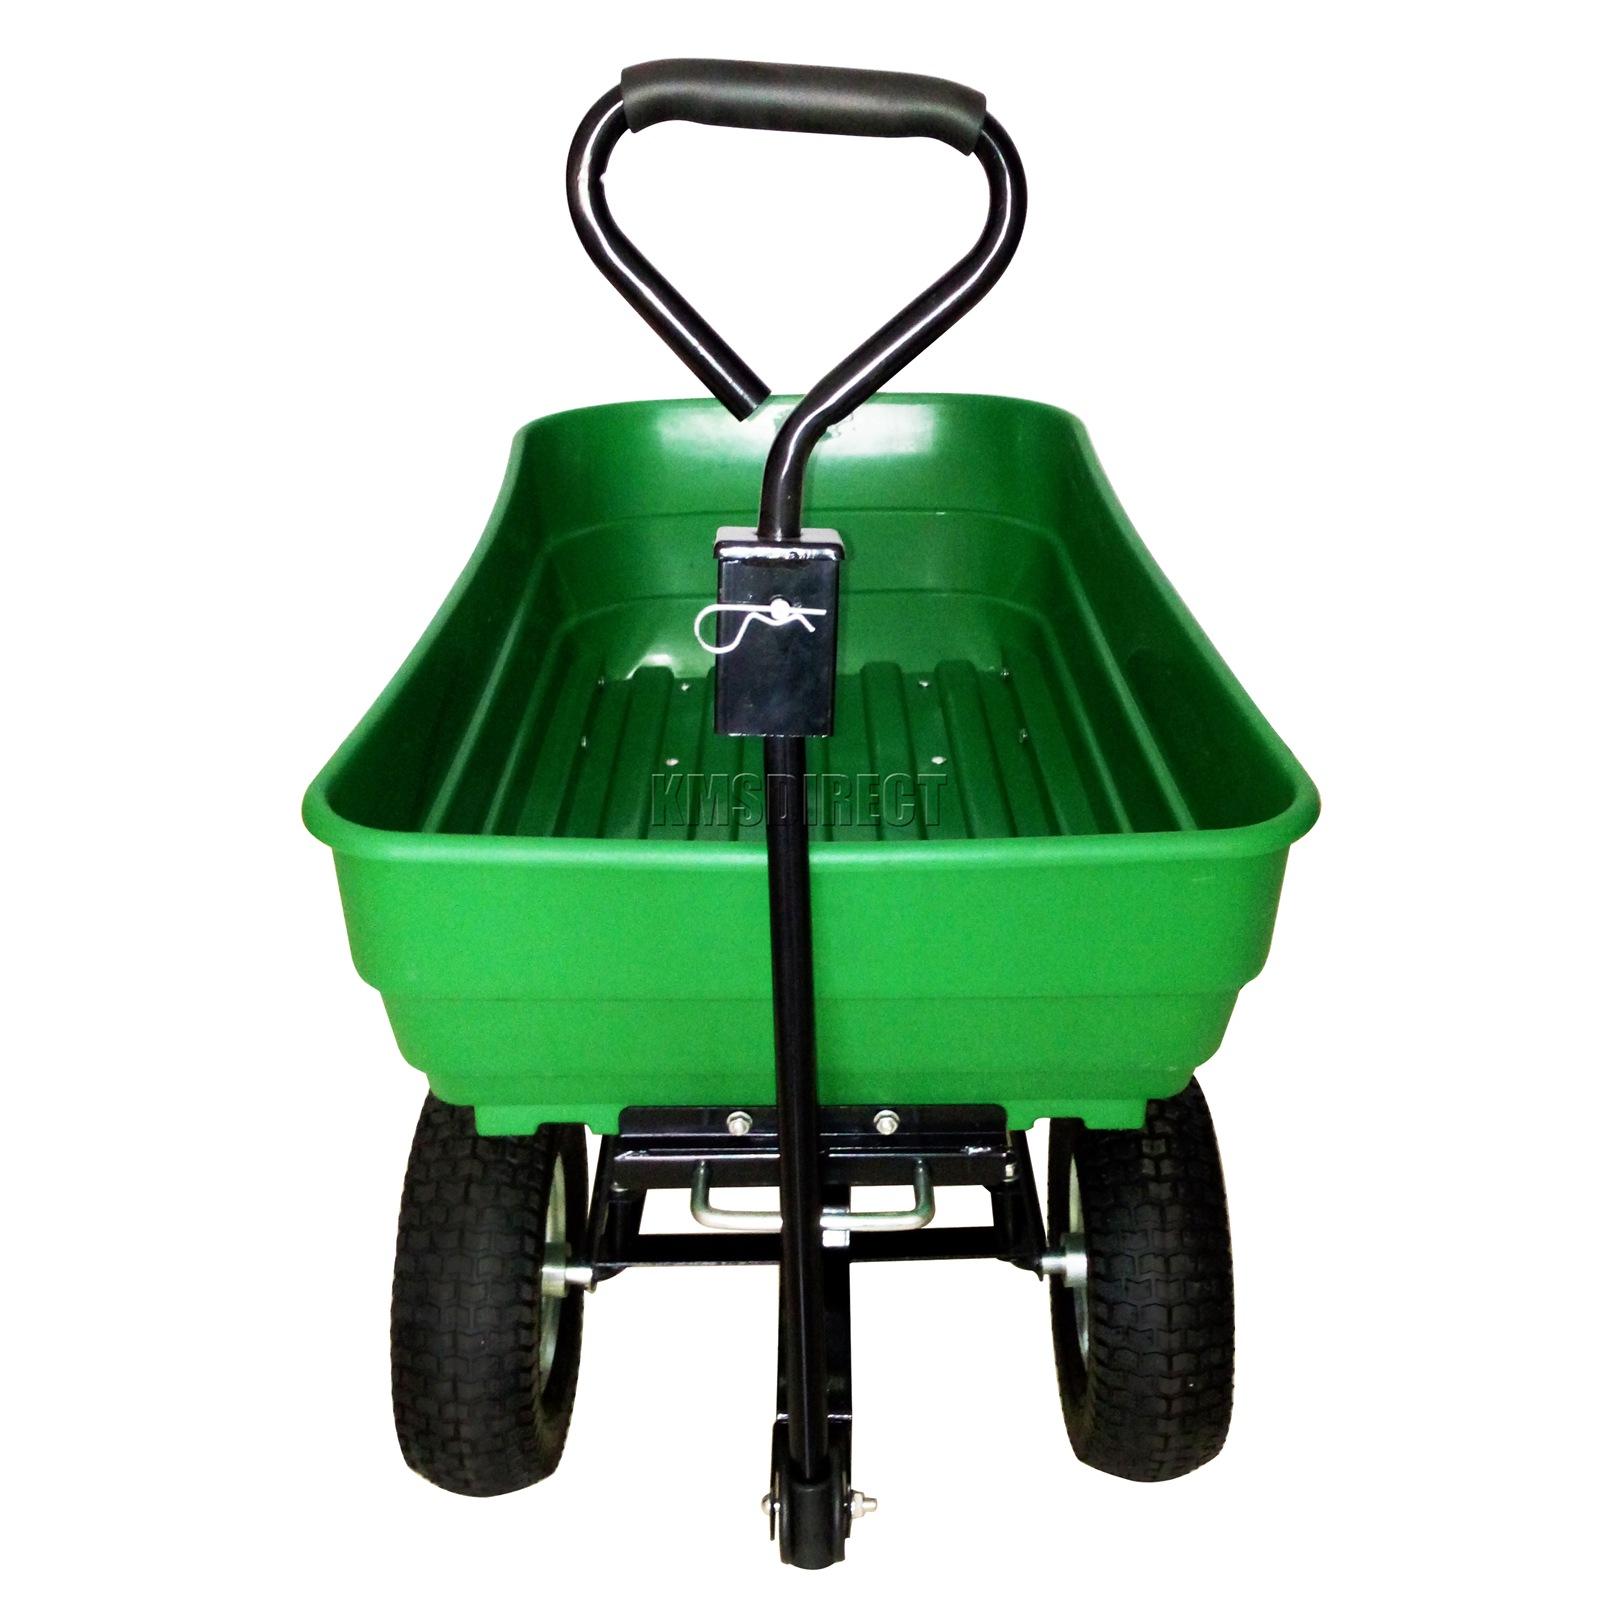 FoxHunter-Heavy-Duty-Garden-Dump-Truck-Tipping-Trailer-Trolley-Cart-Wheelbarrow miniatuur 31